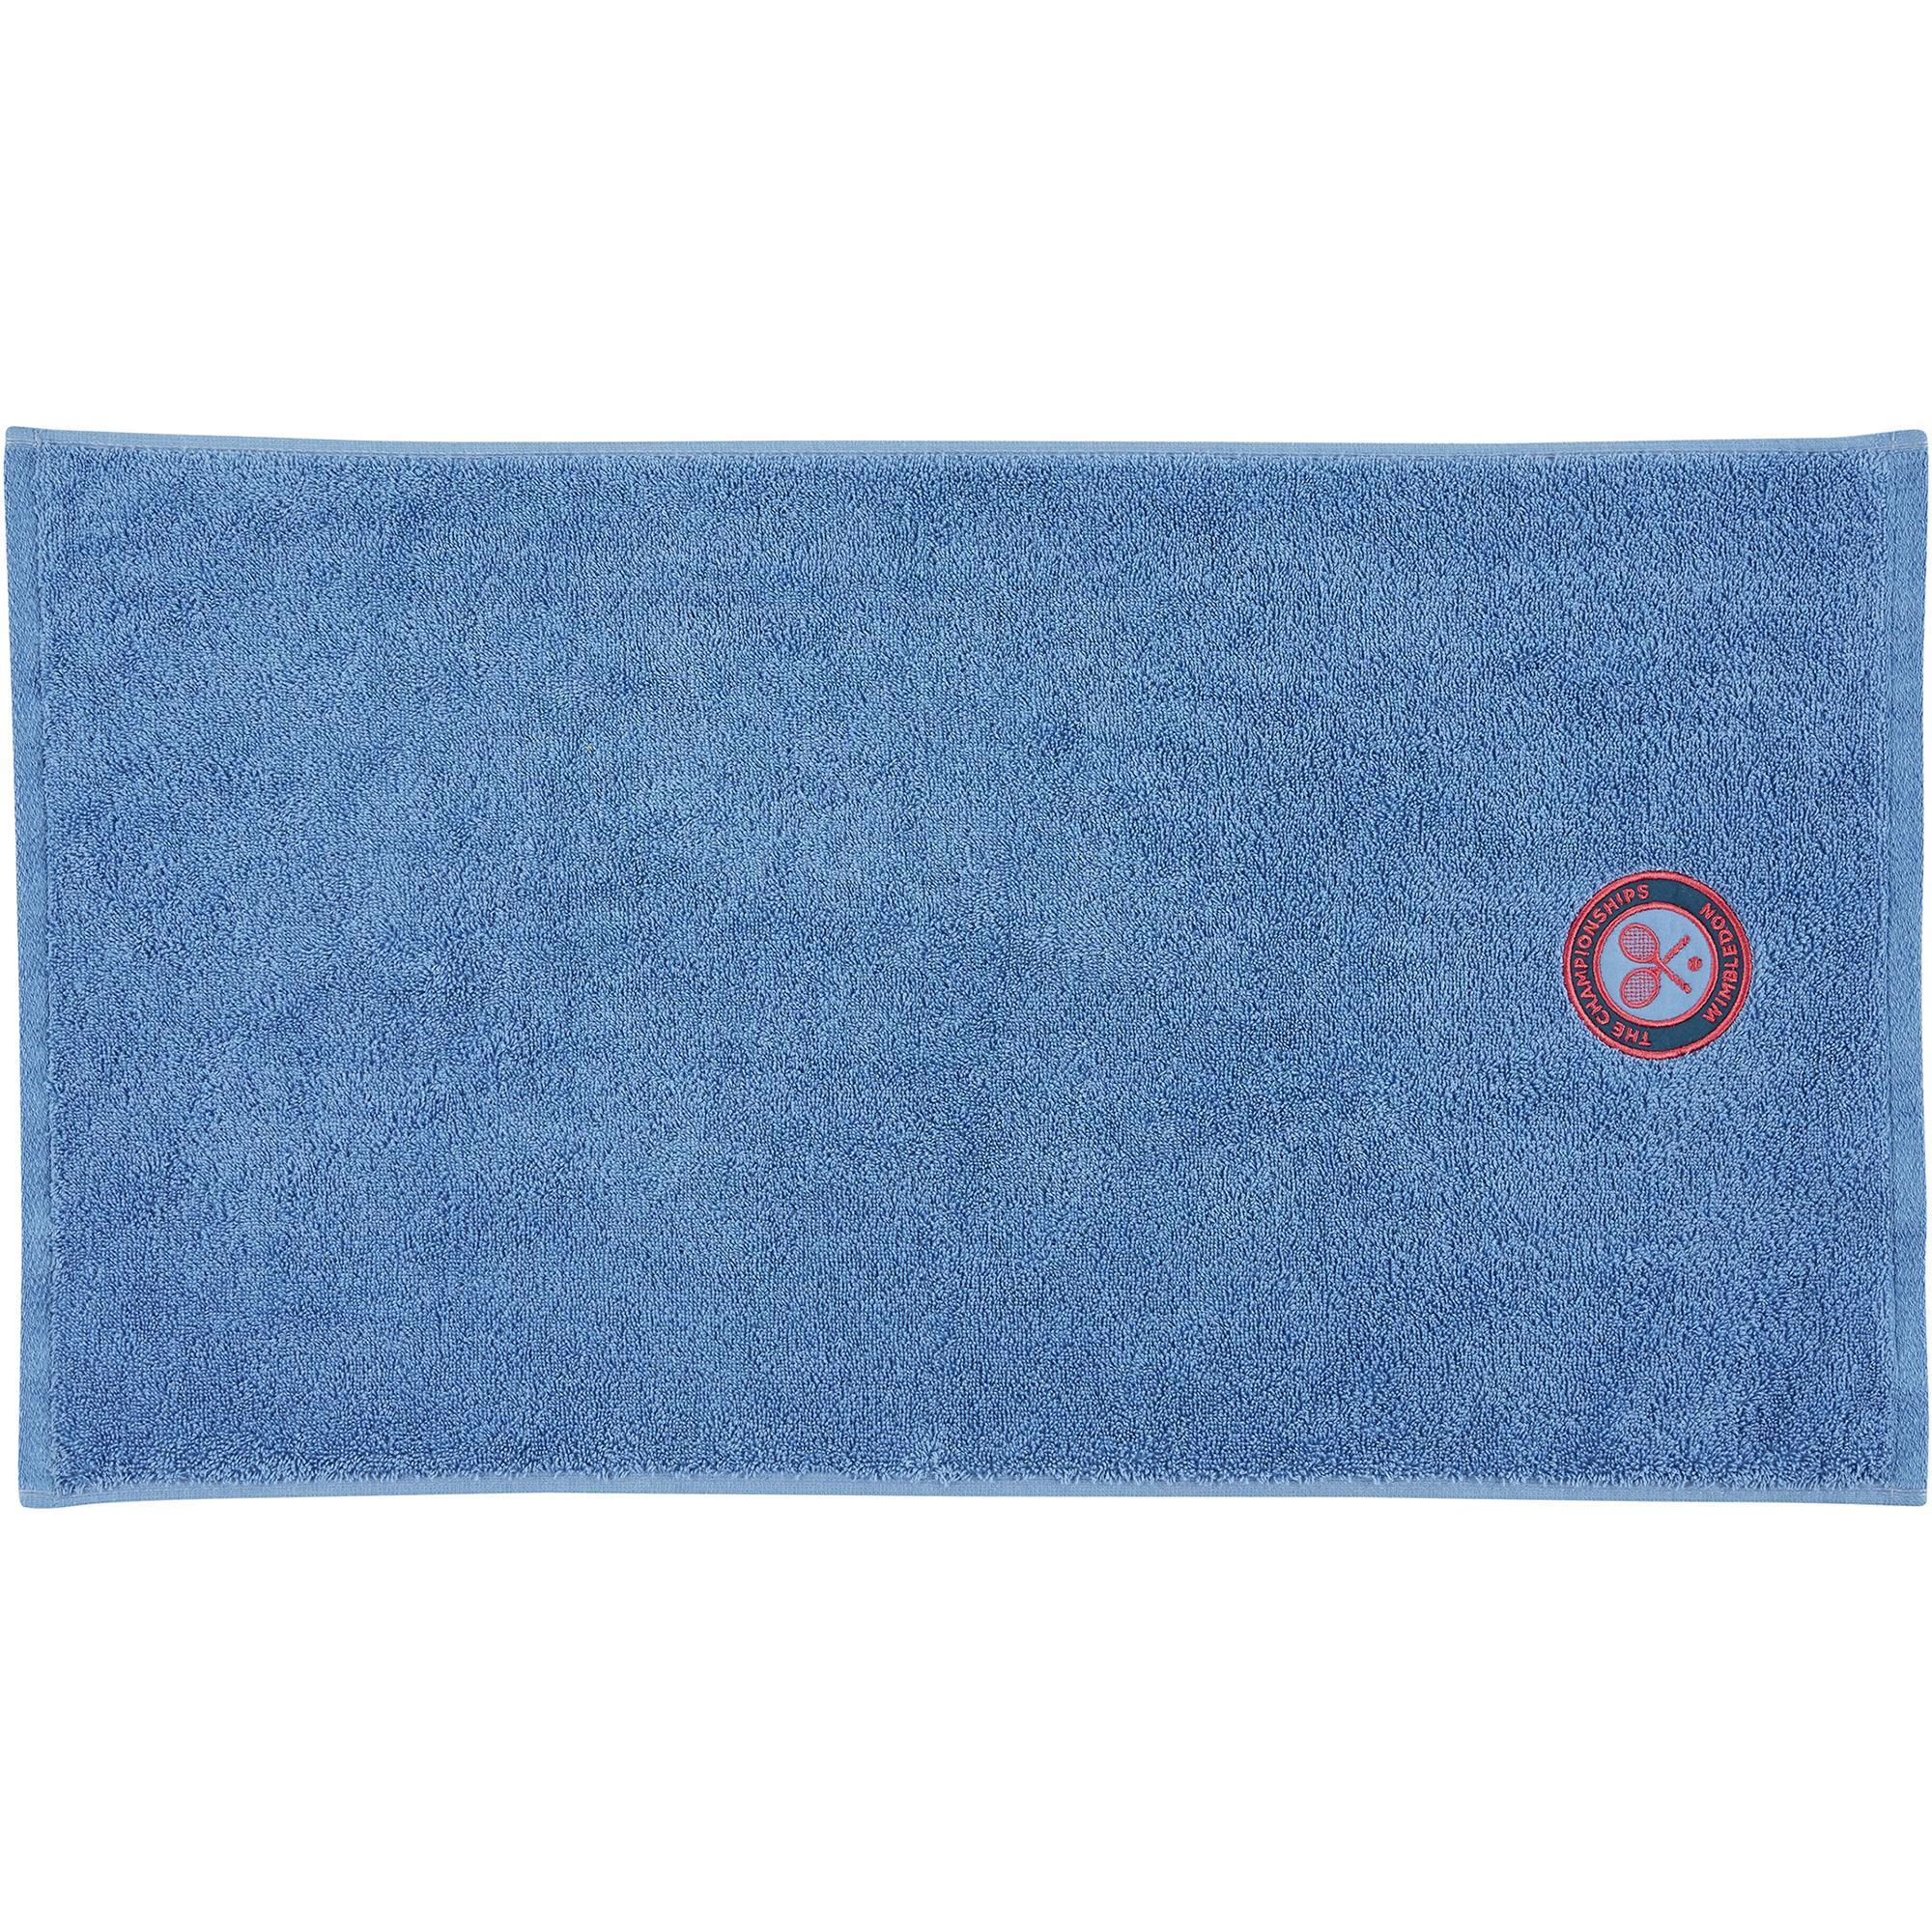 Christy wimbledon championships guest towel cornflower blue christy wimbledon championships guest towel cornflower blue izmirmasajfo